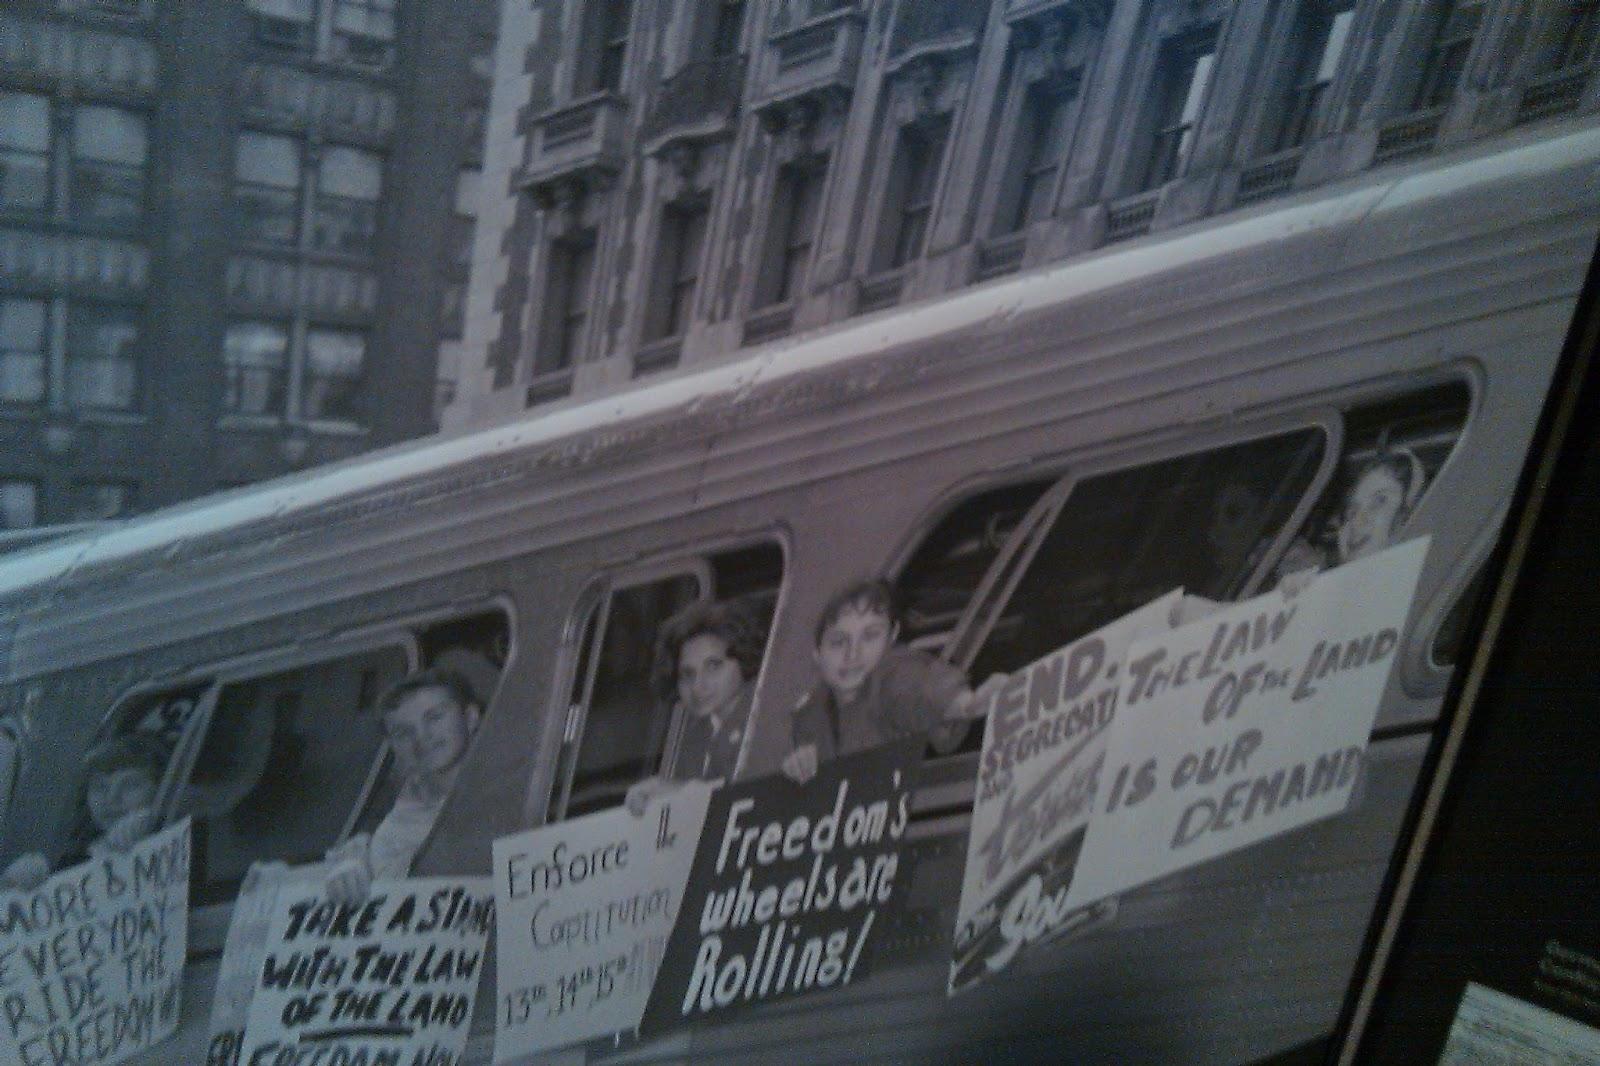 http://2.bp.blogspot.com/-Ak1dMzGoXsg/T00XZlLMReI/AAAAAAAAEKI/L9kxER_YYvA/s1600/Freedom+Riders+Four.jpg